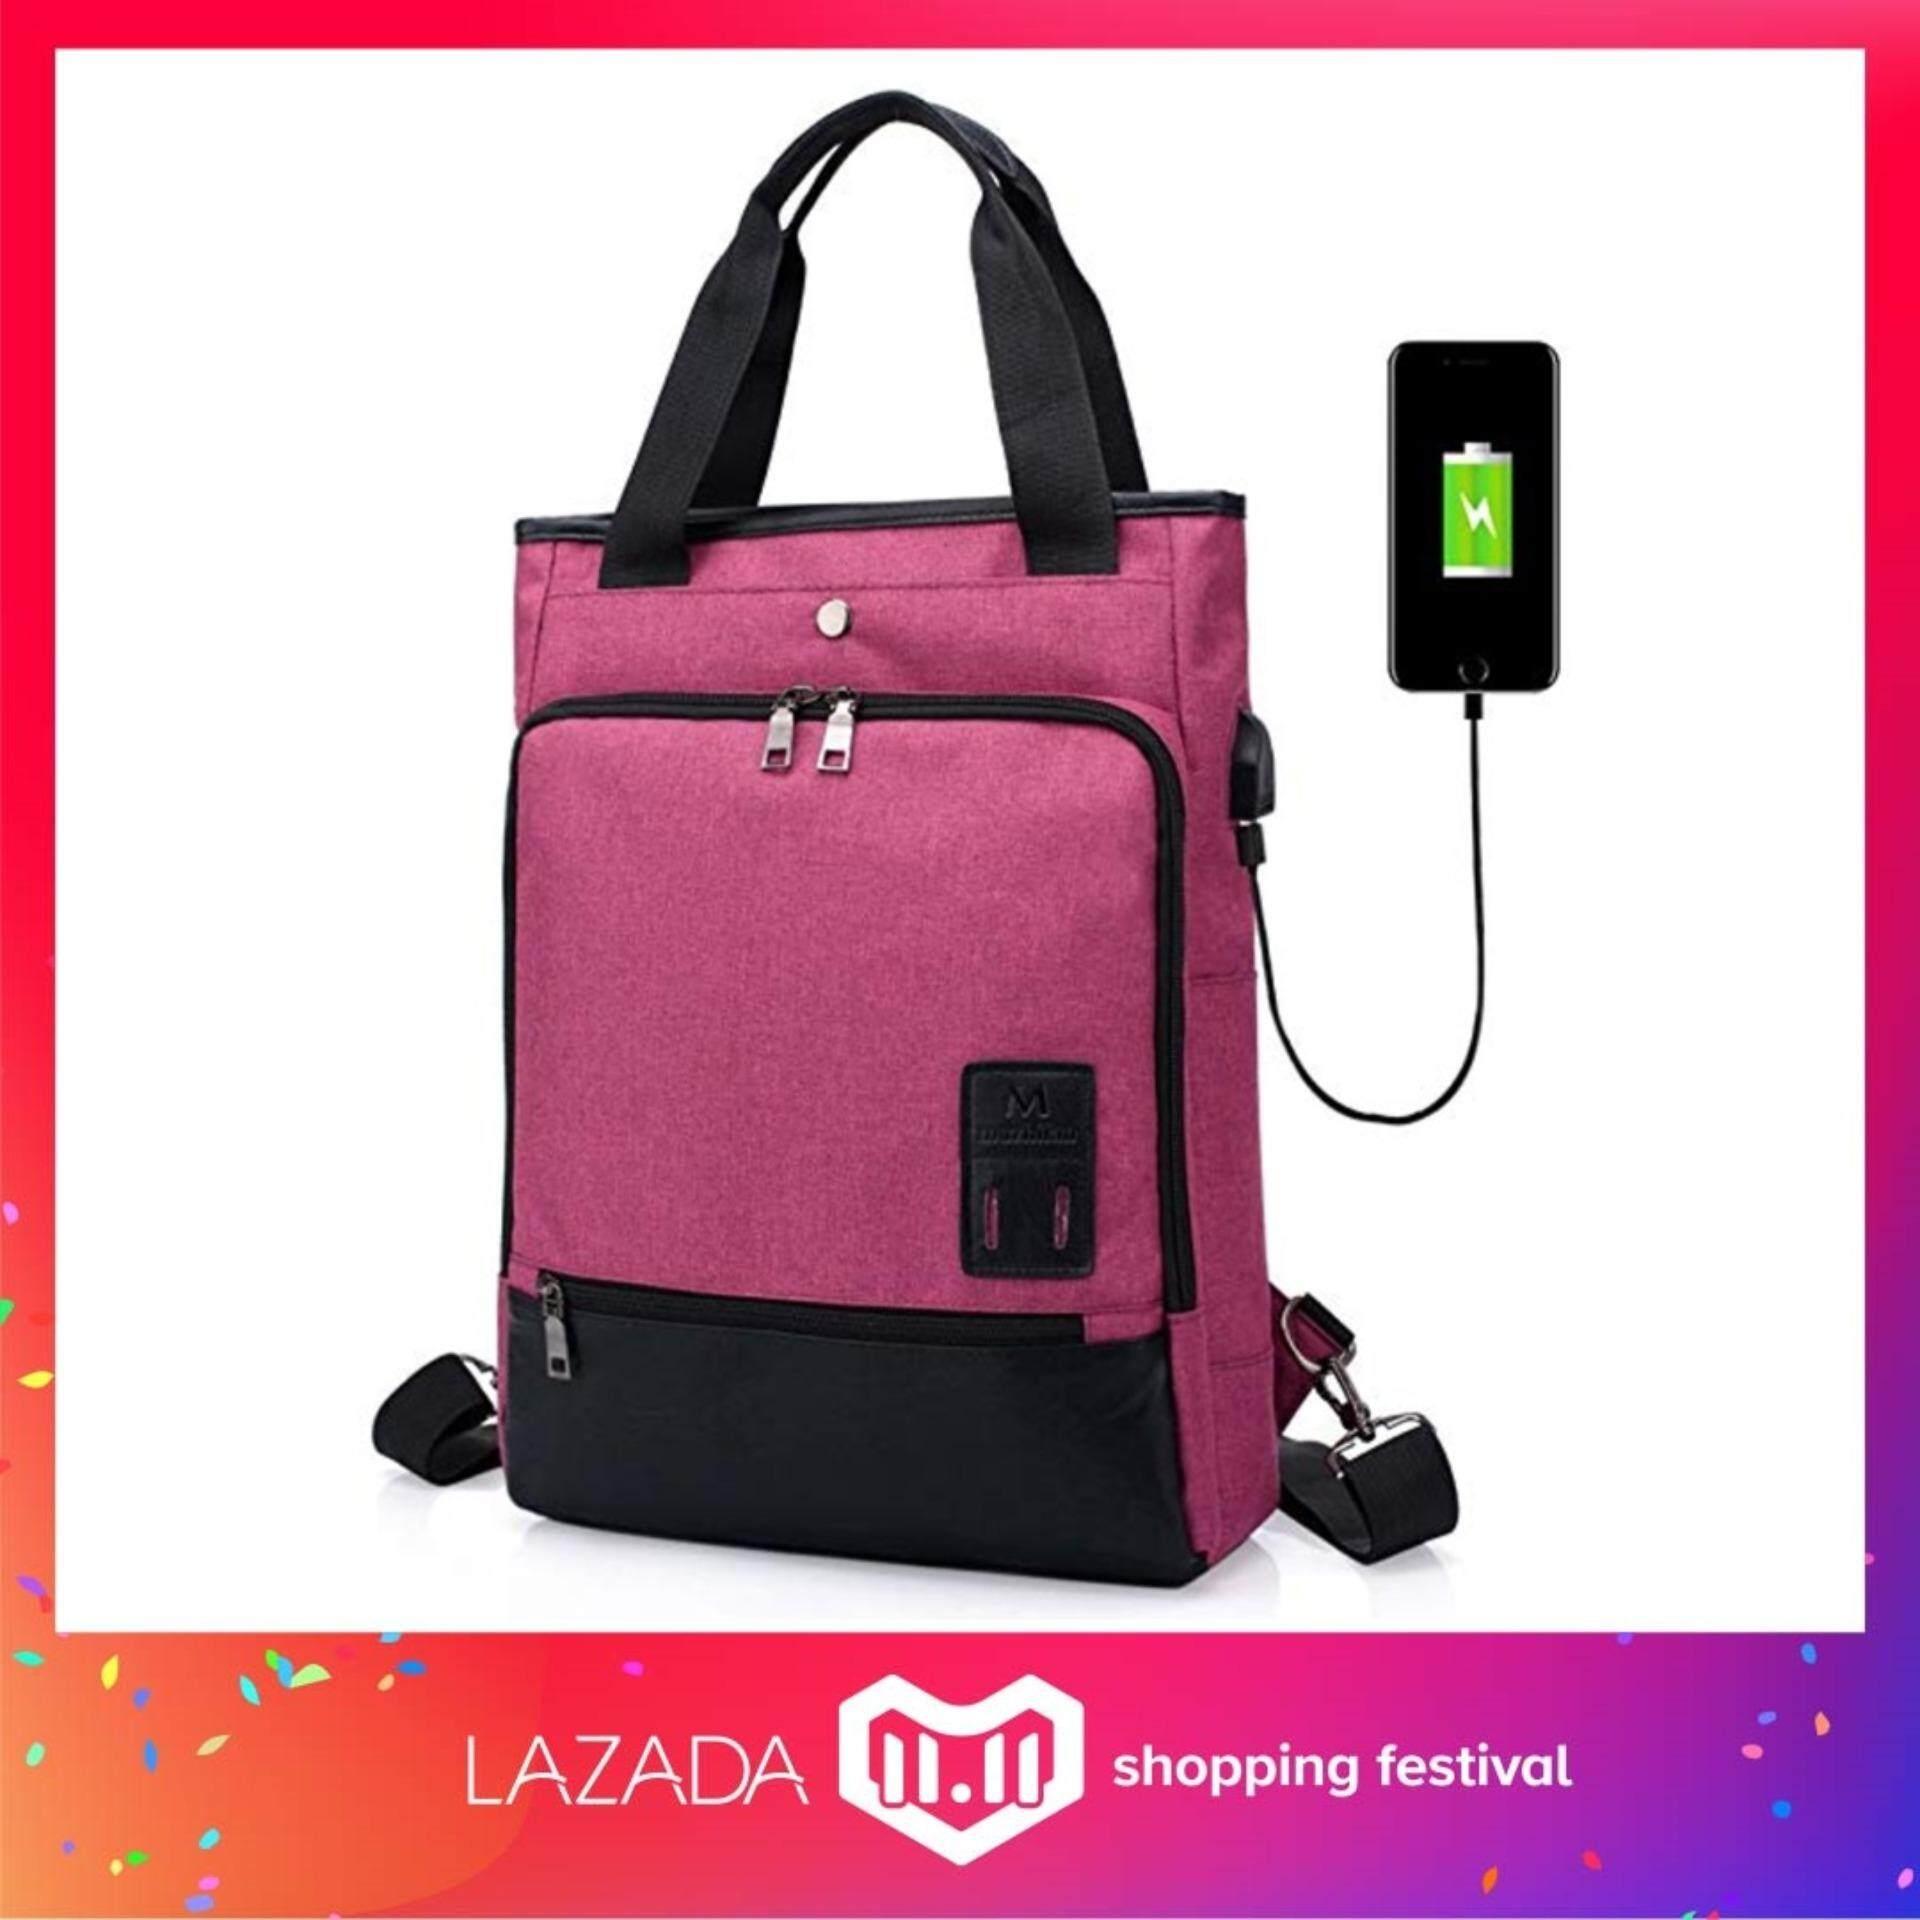 【TEEMI】 USB Backpack Shoulder Handbag 2 Way Casual Travel College Student School Business Laptop Bag